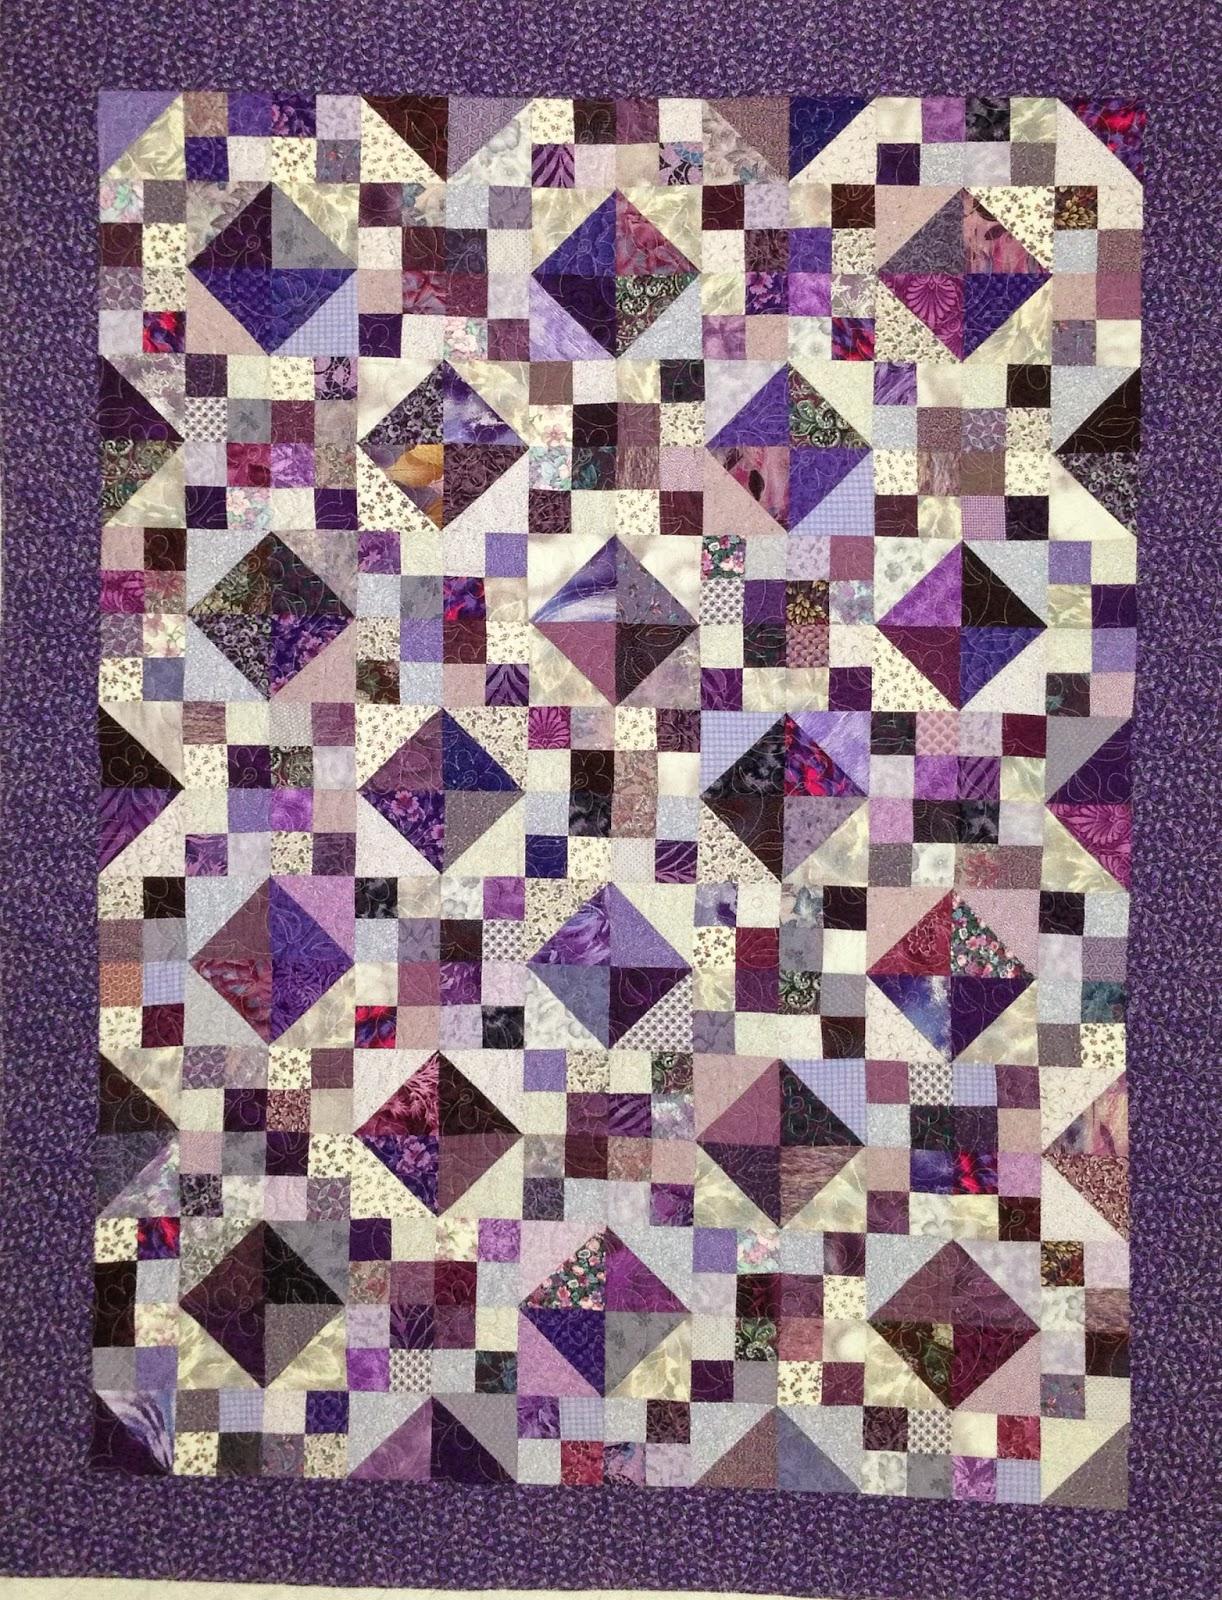 Pearl Combs Multi Lavender Scrap Quilt